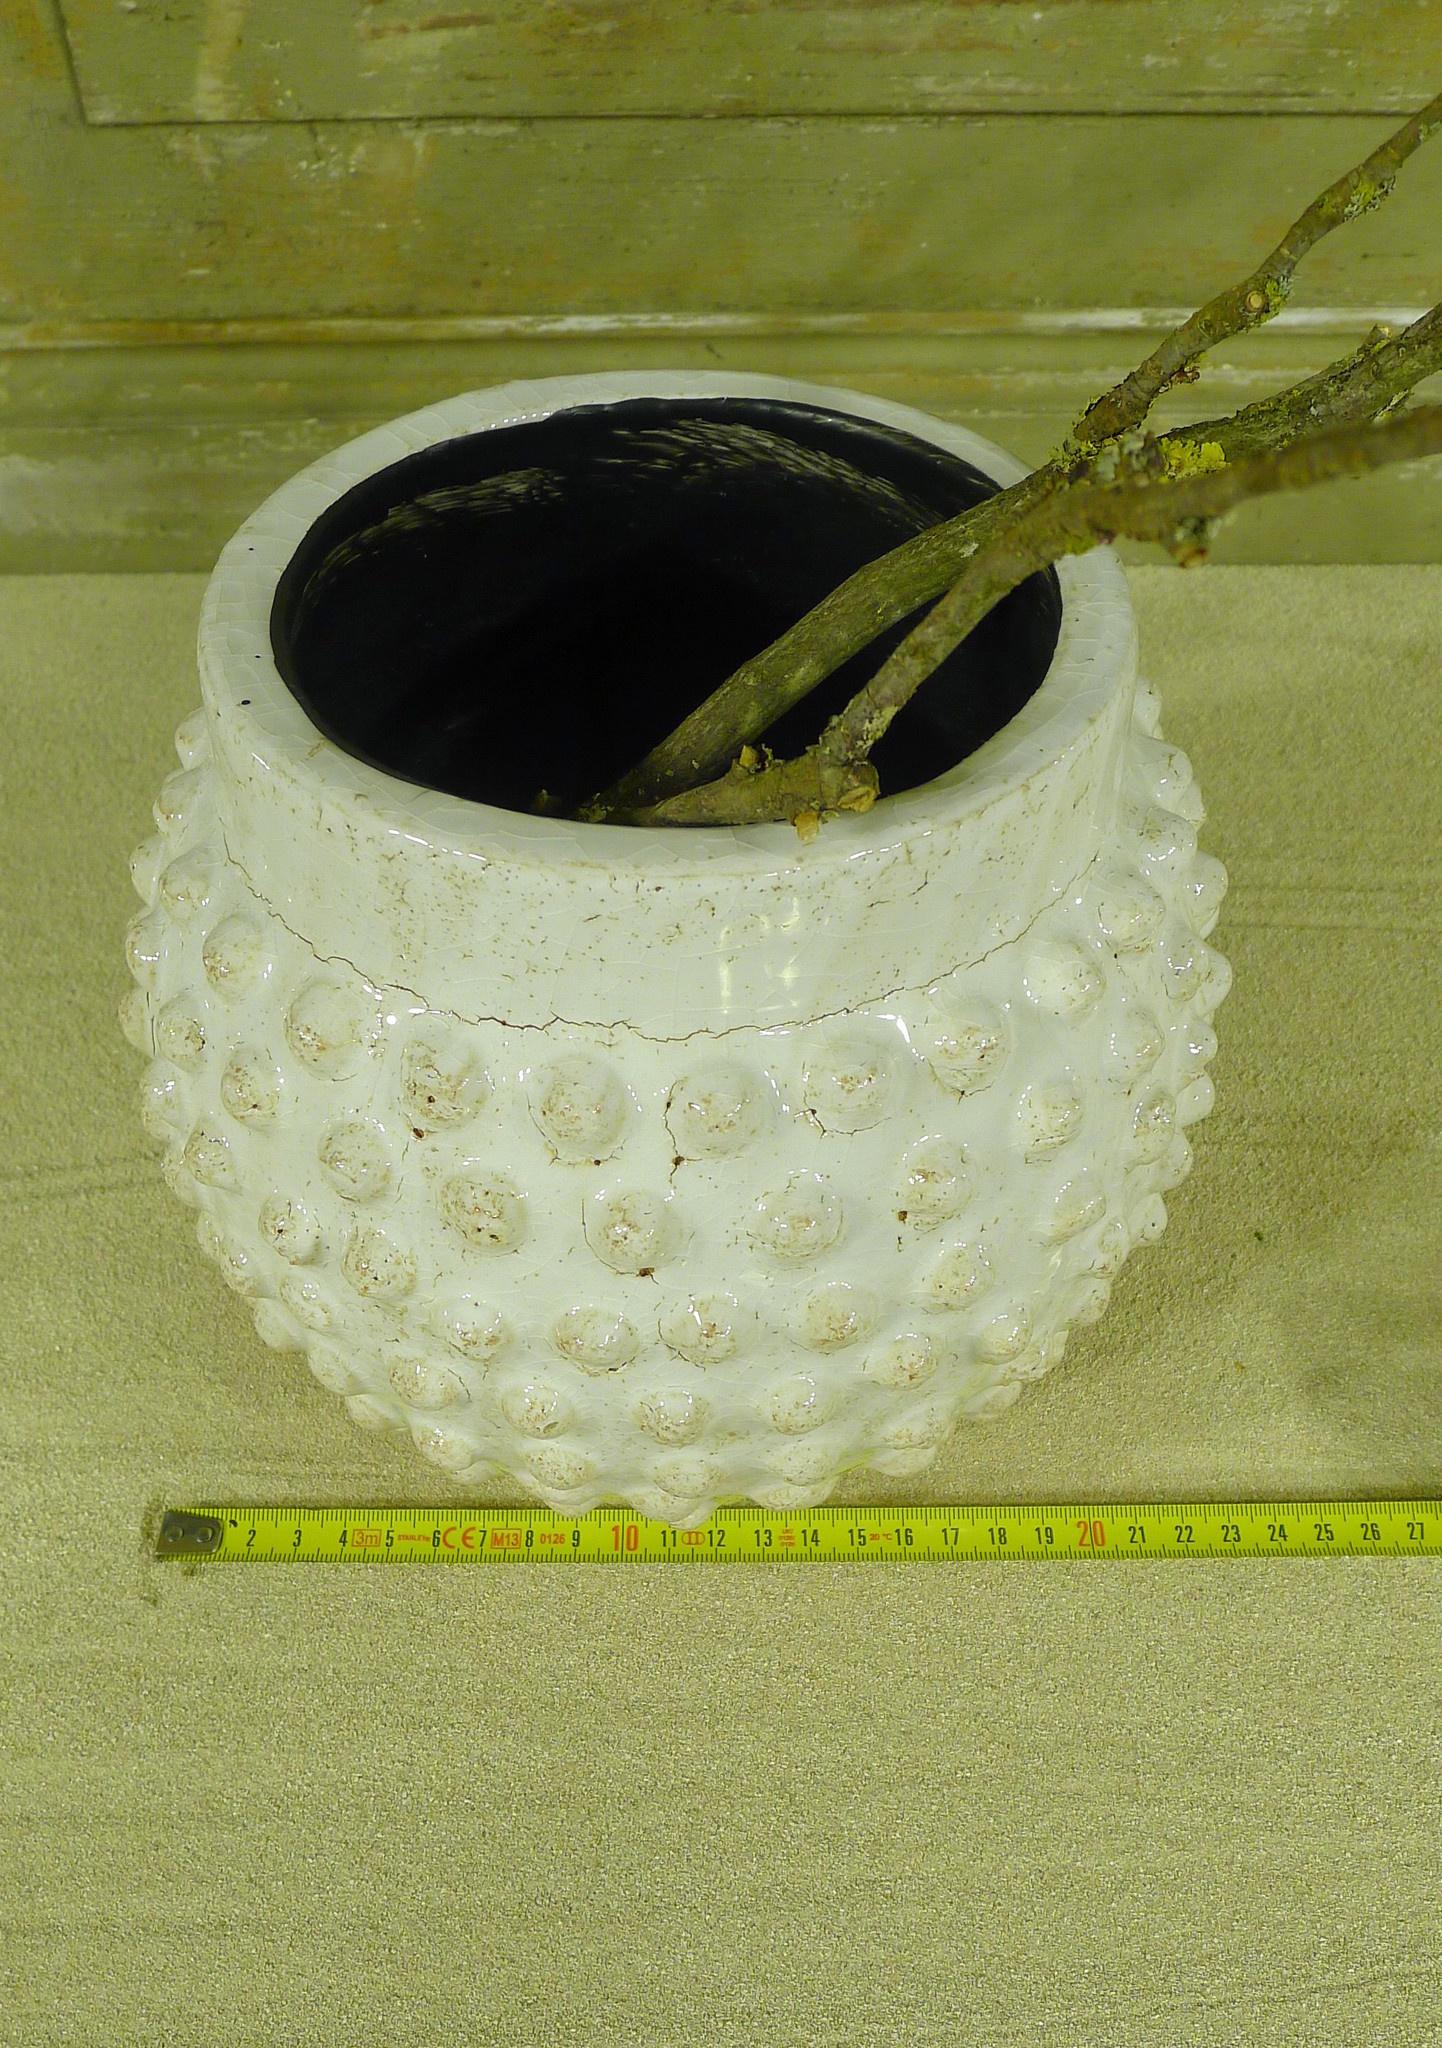 potceramicdot creme 21-10